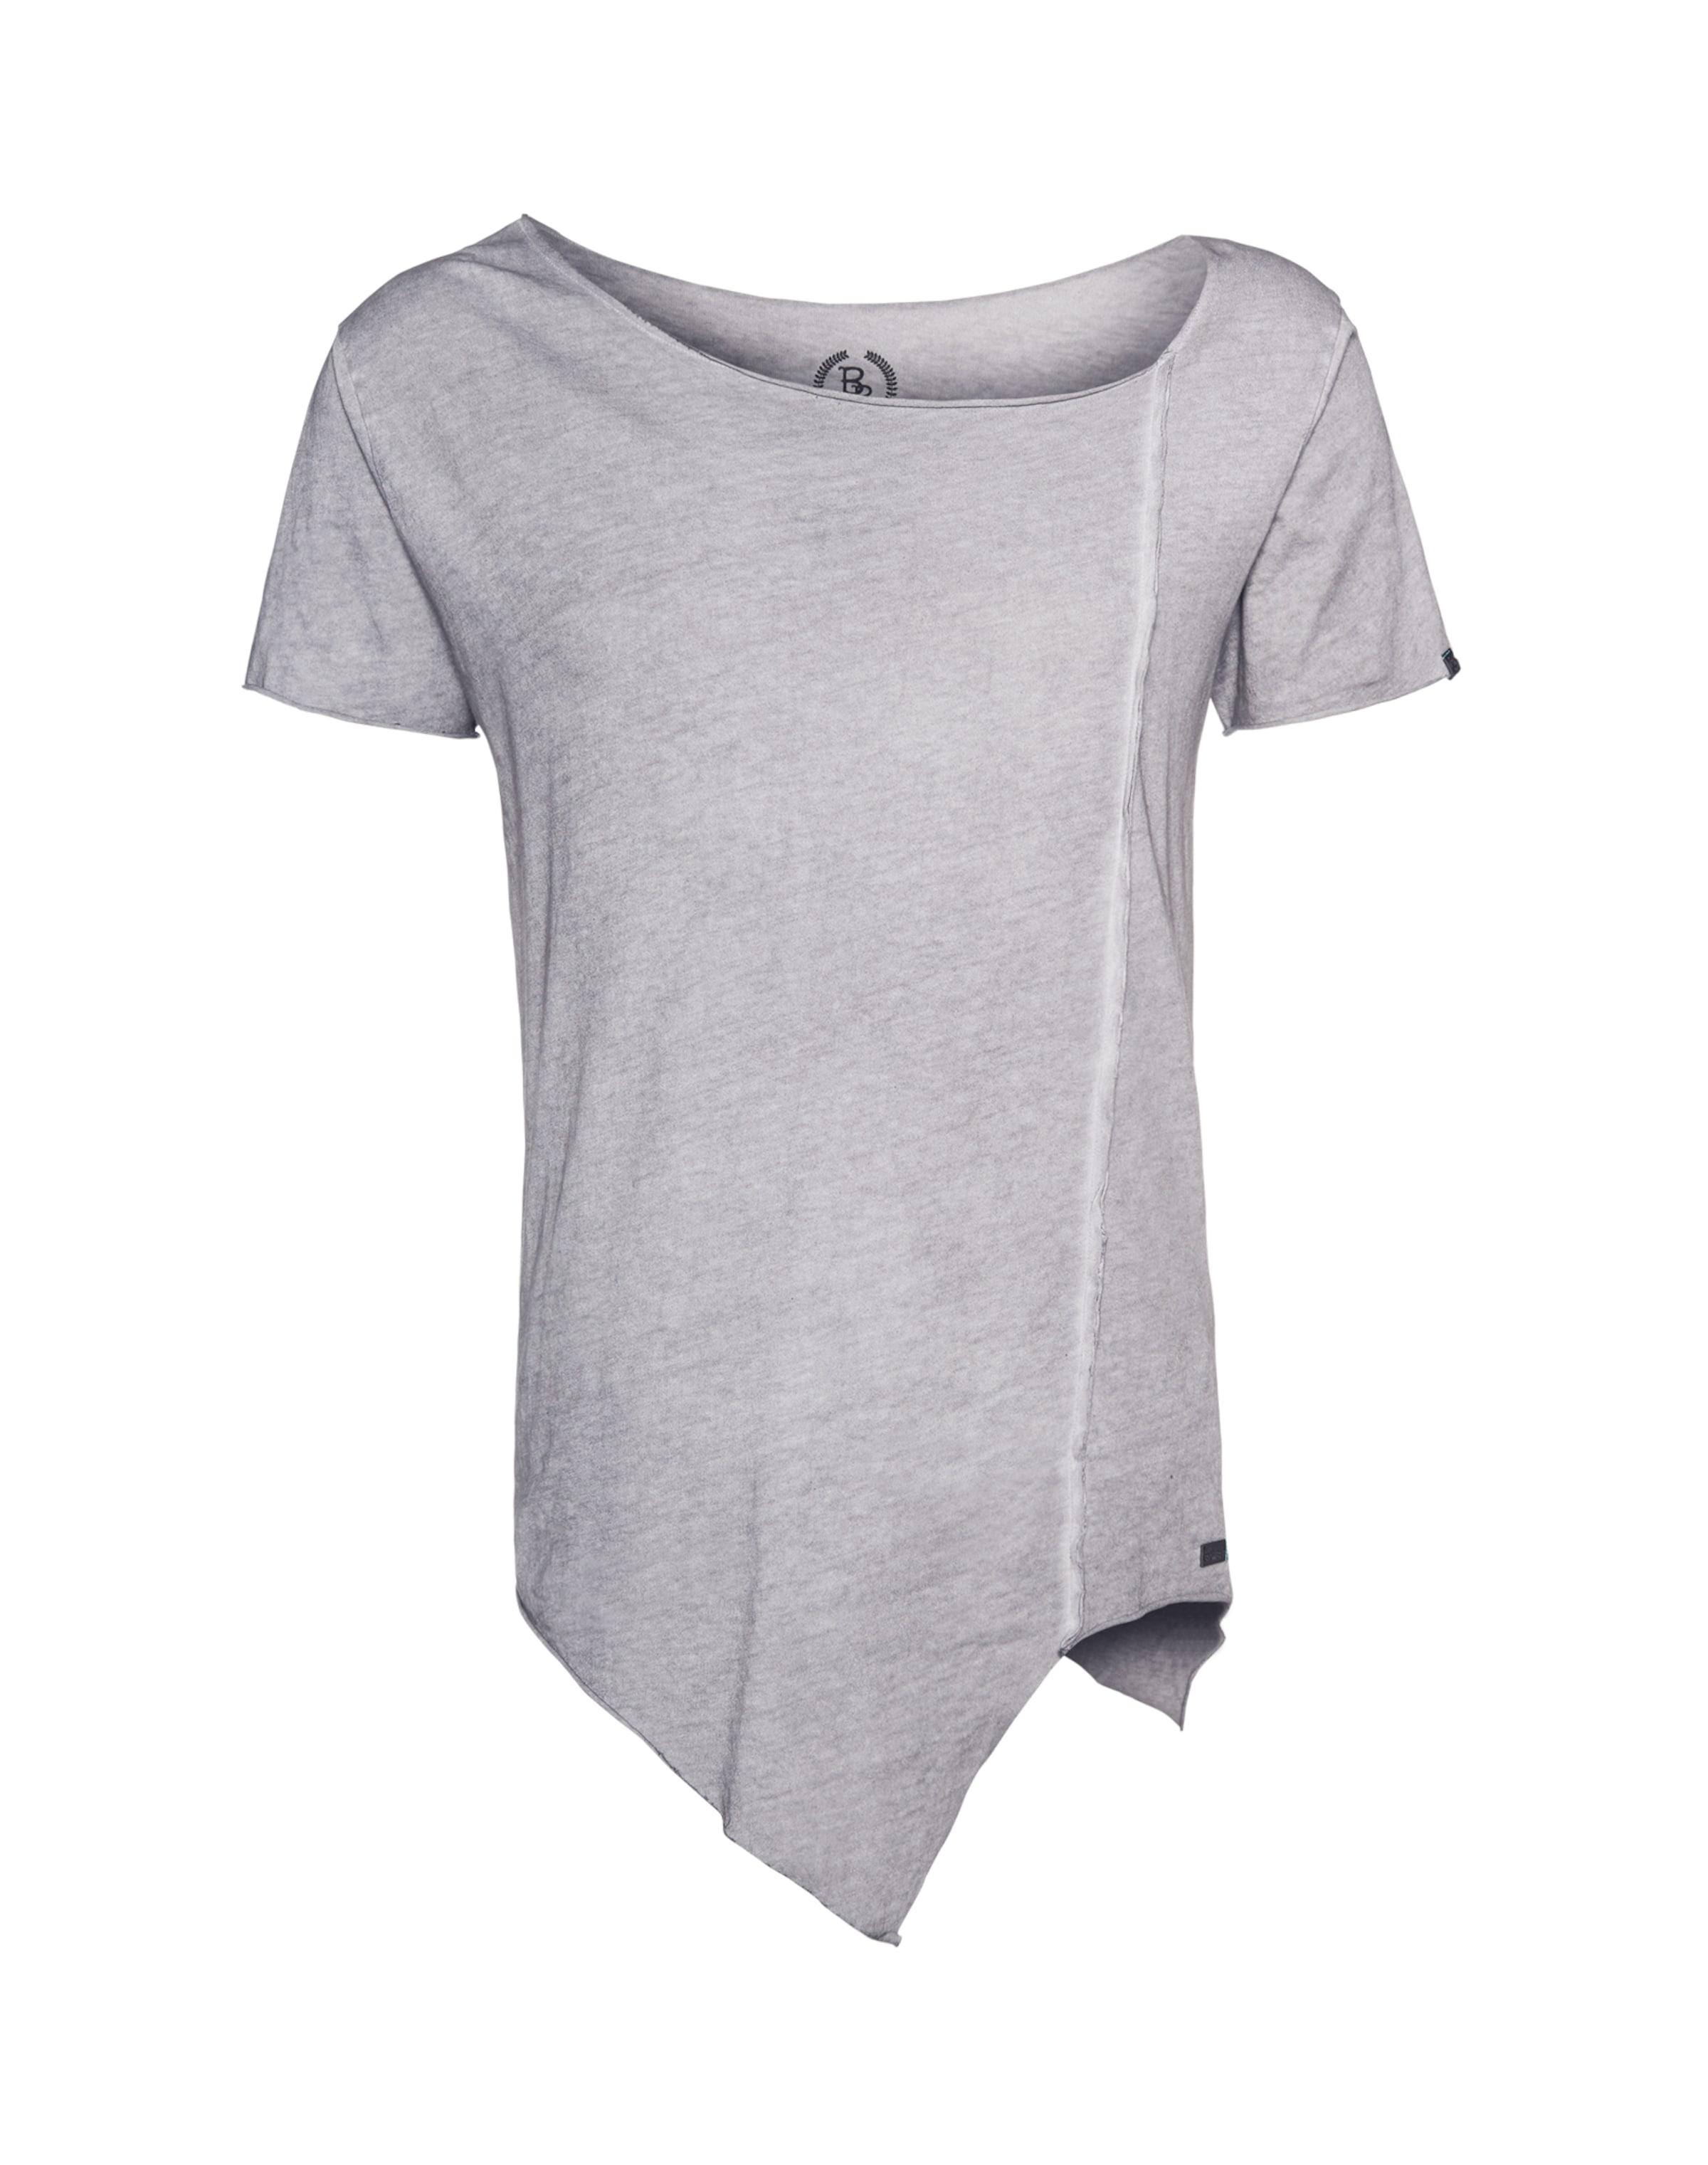 shirt Boom 'killer' T In Grau Bap 80POnNkXw